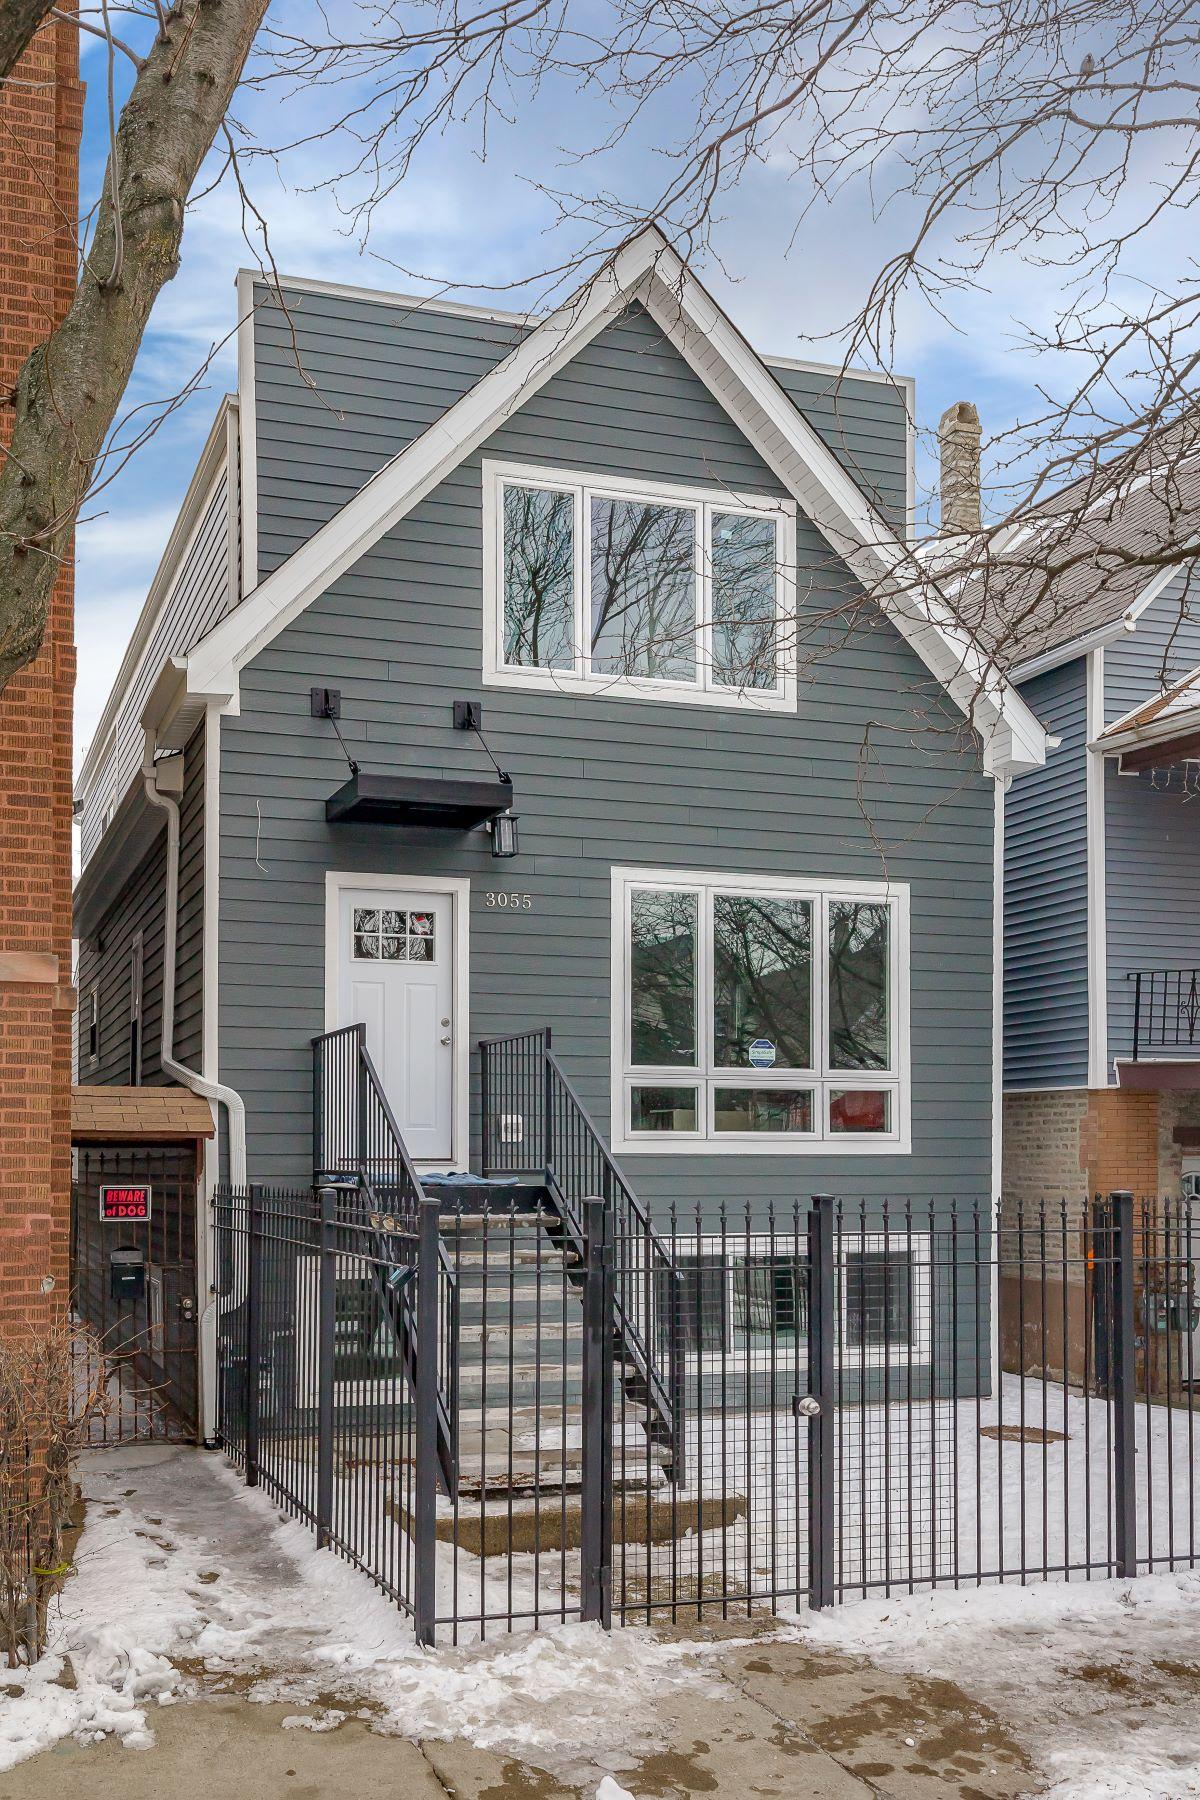 Fully Renovated Logan Square Home 3055 N Central Park Avenue Chicago, Illinois 60618 Estados Unidos